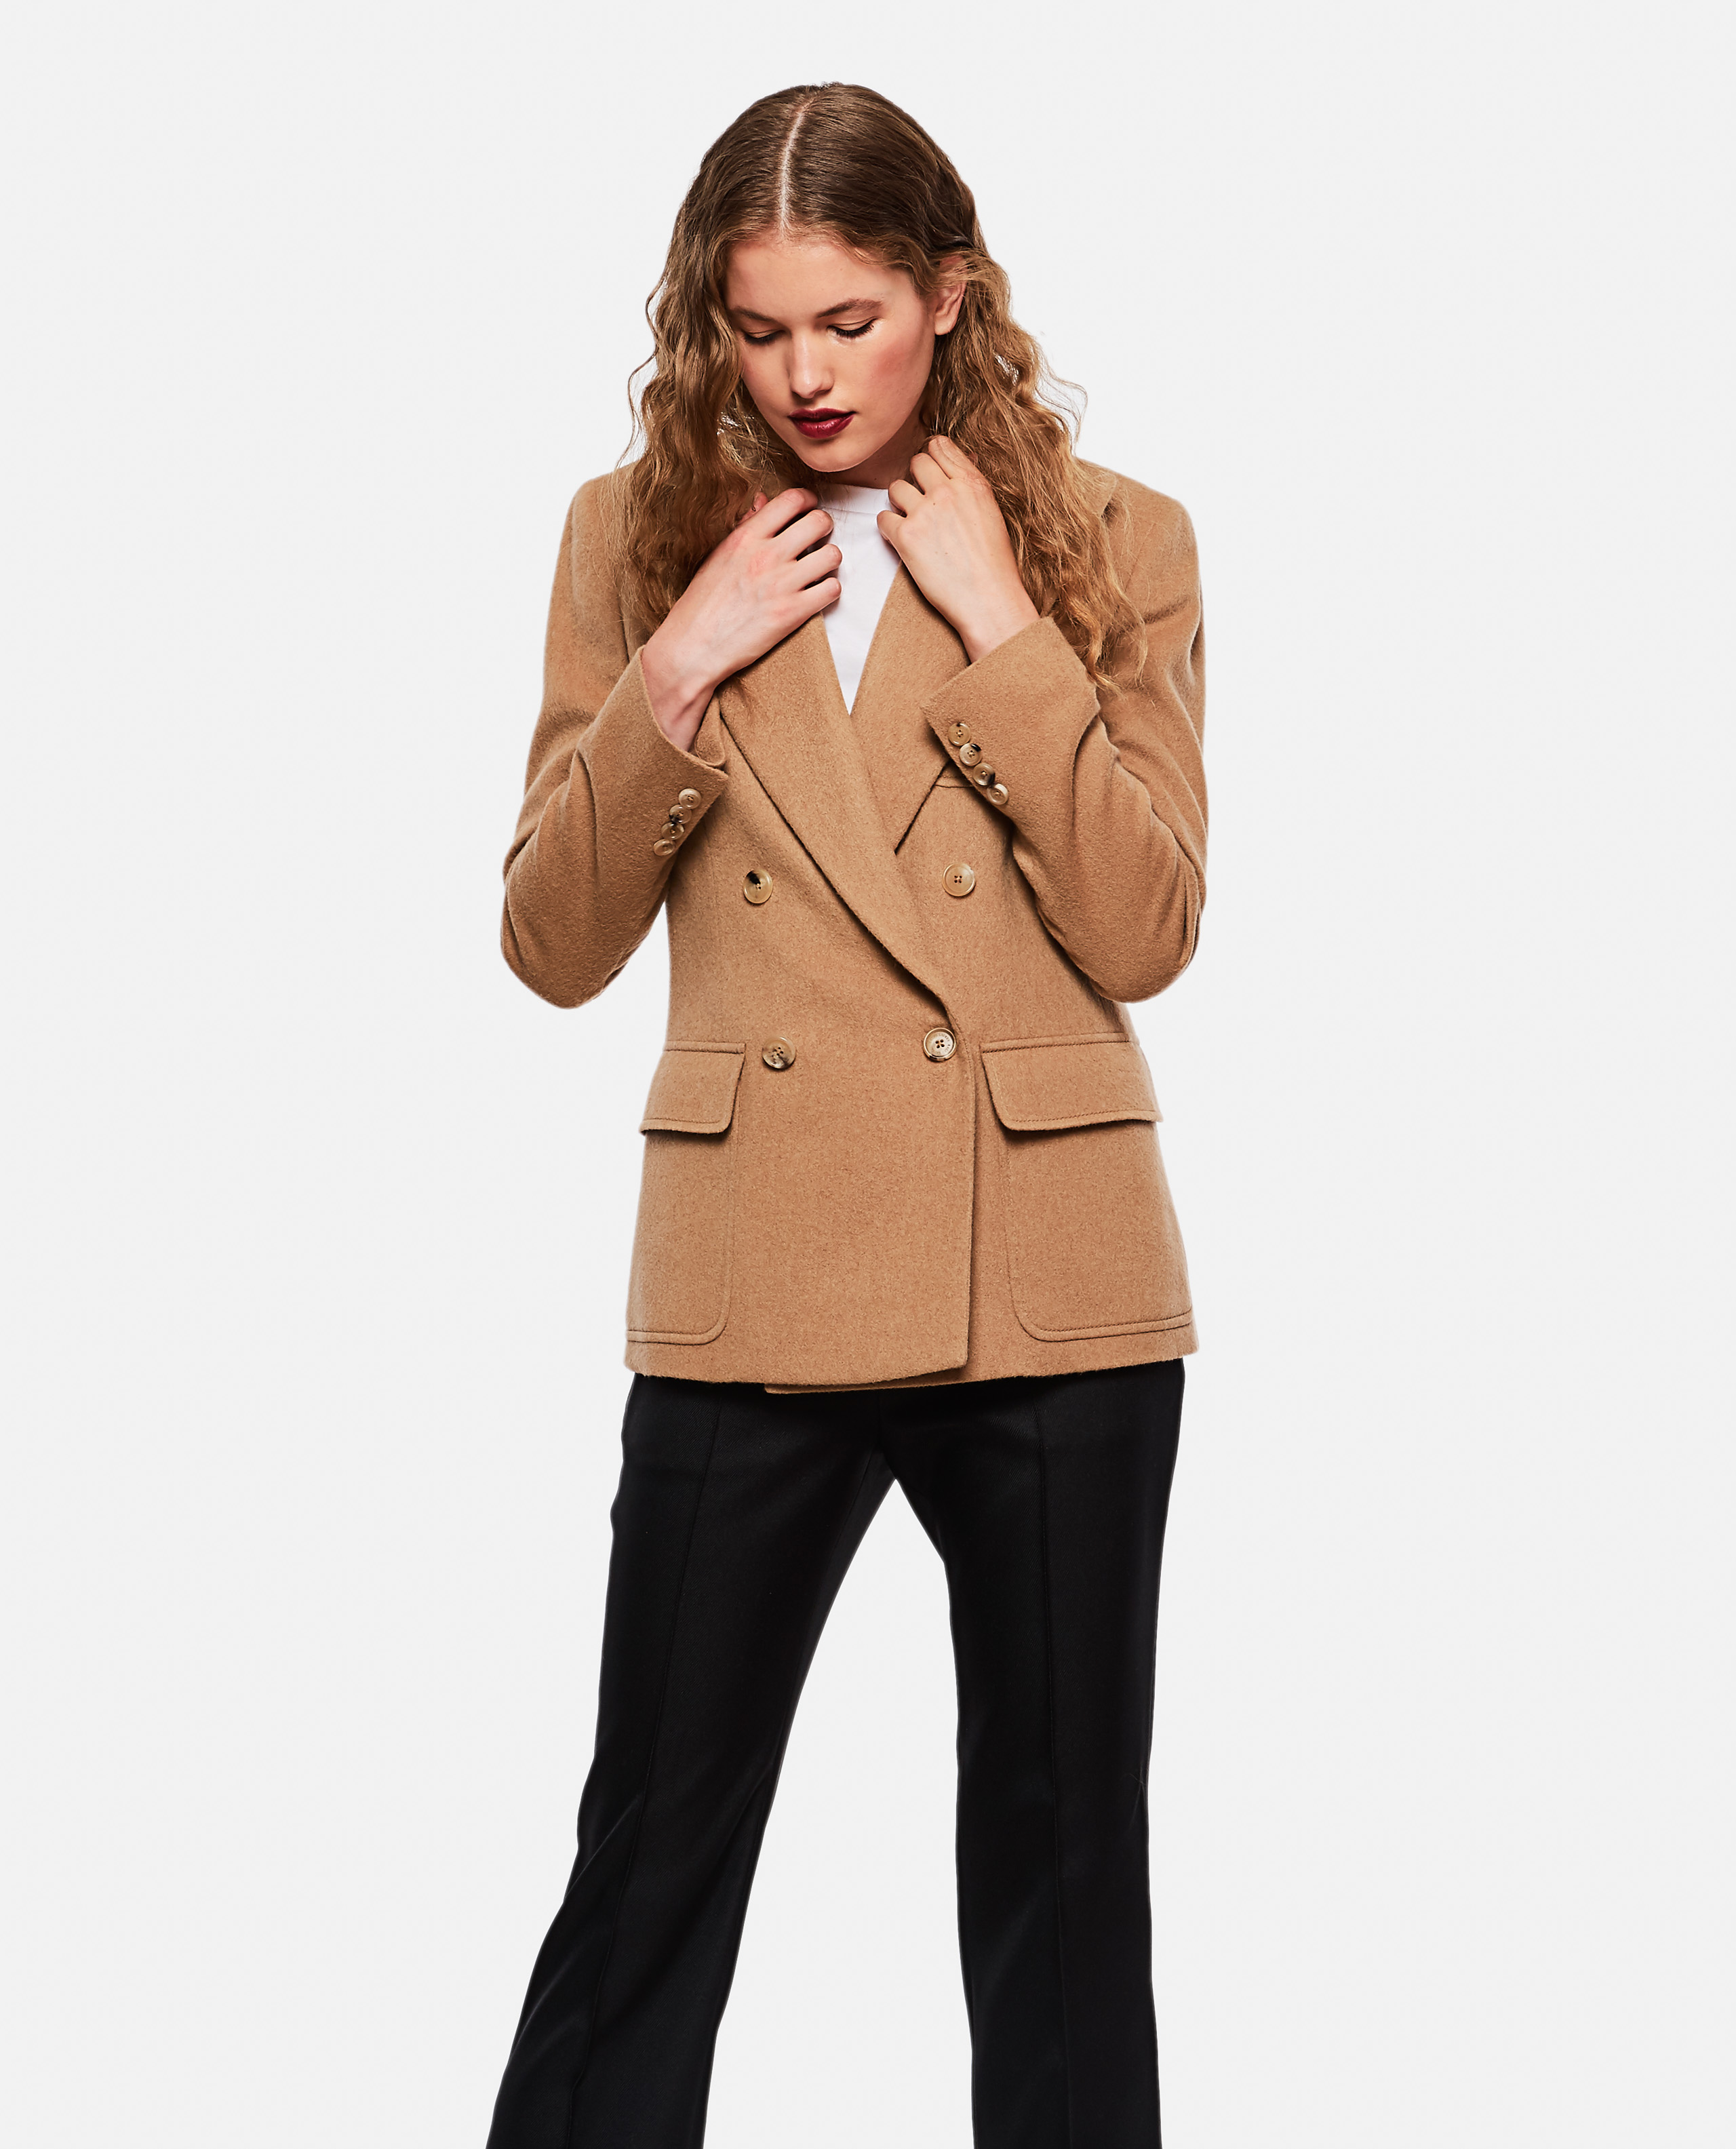 Caley jacket